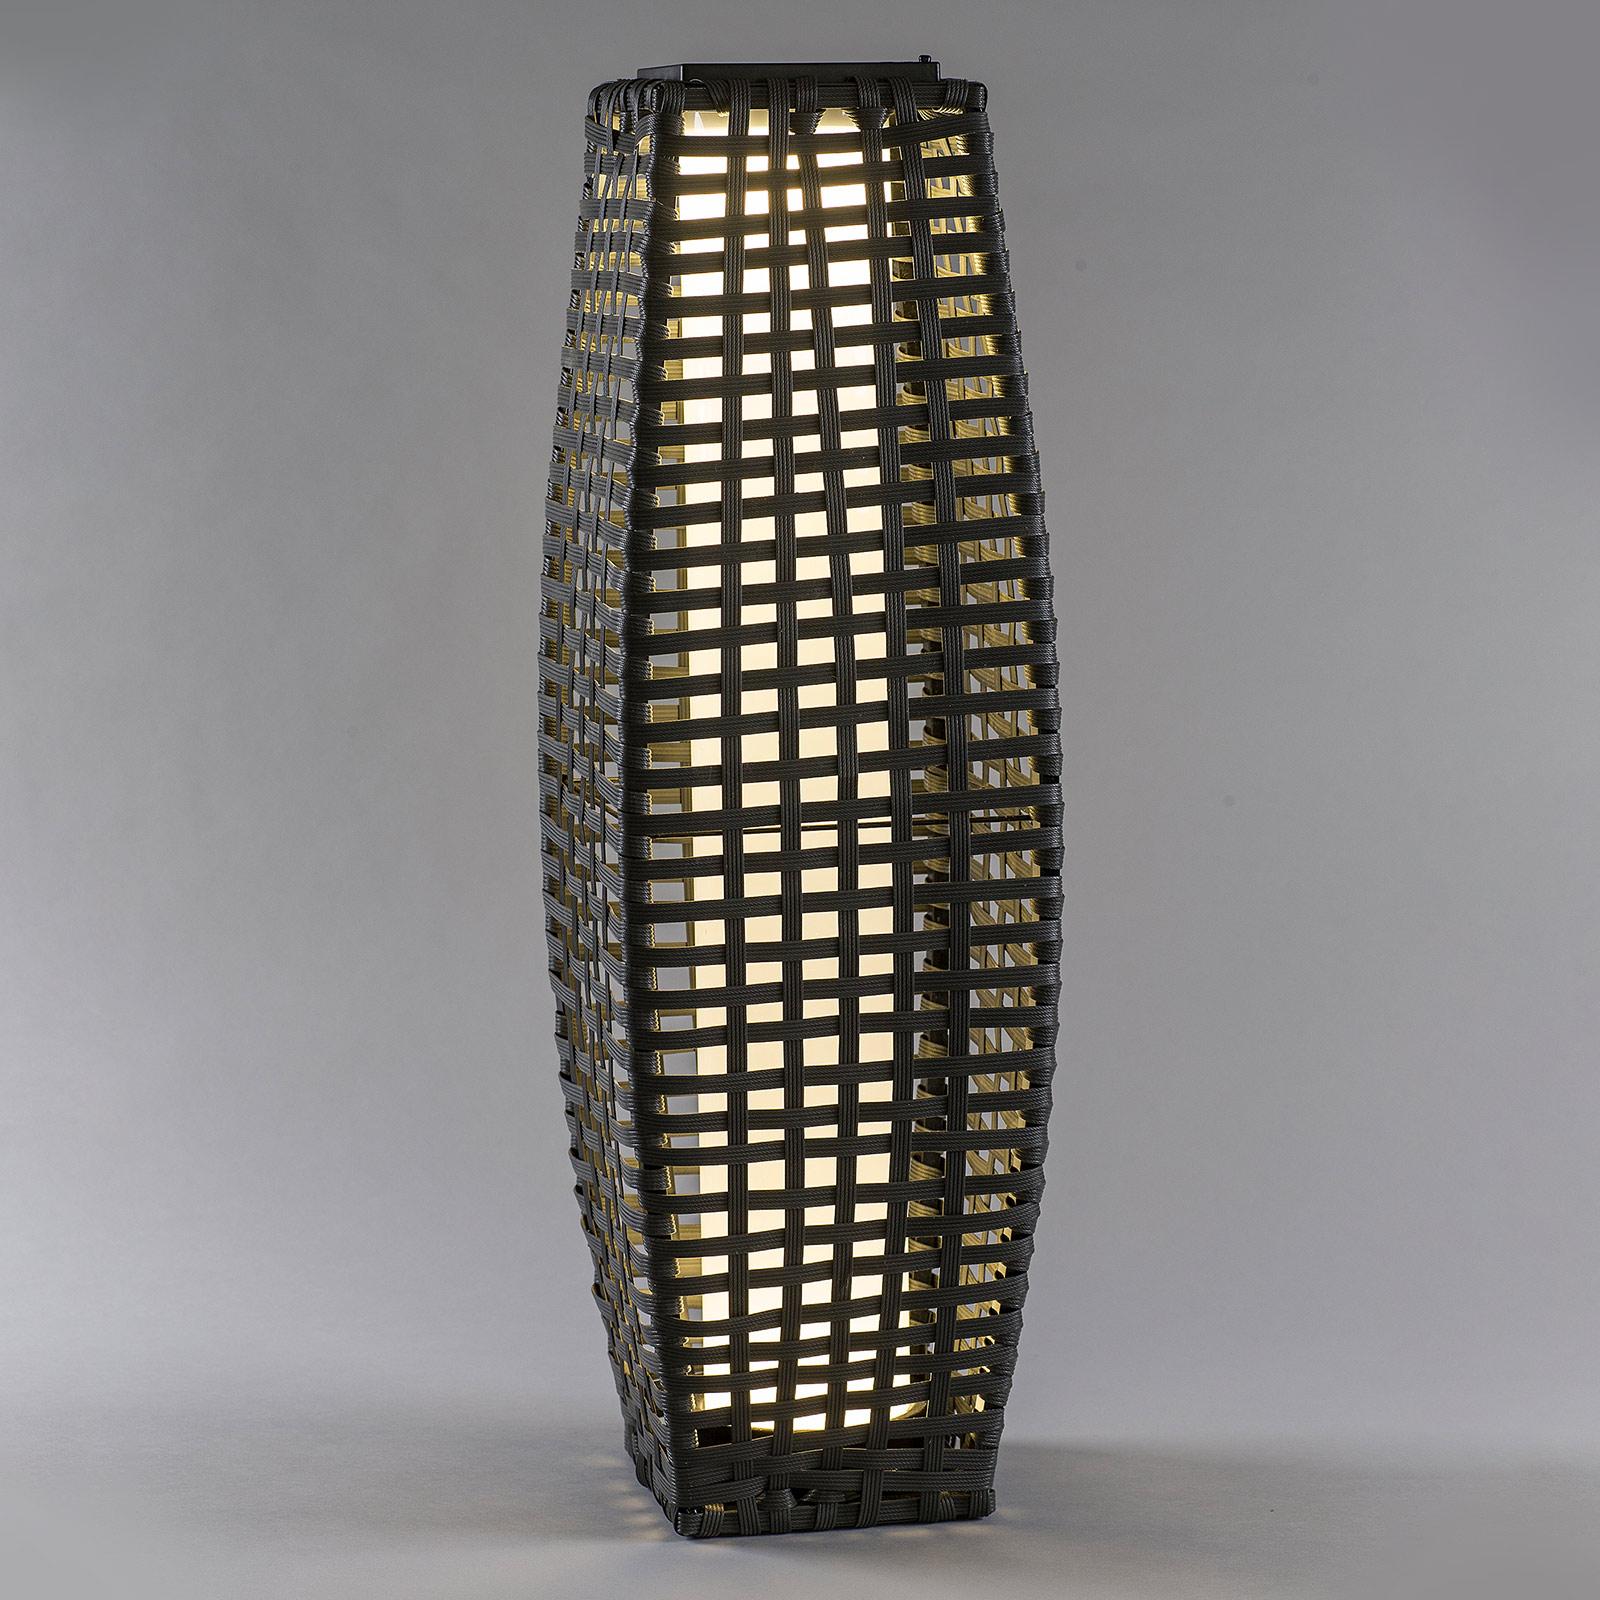 LED-Solarleuchte Säule Rattan, bauchig, dunkelgrau